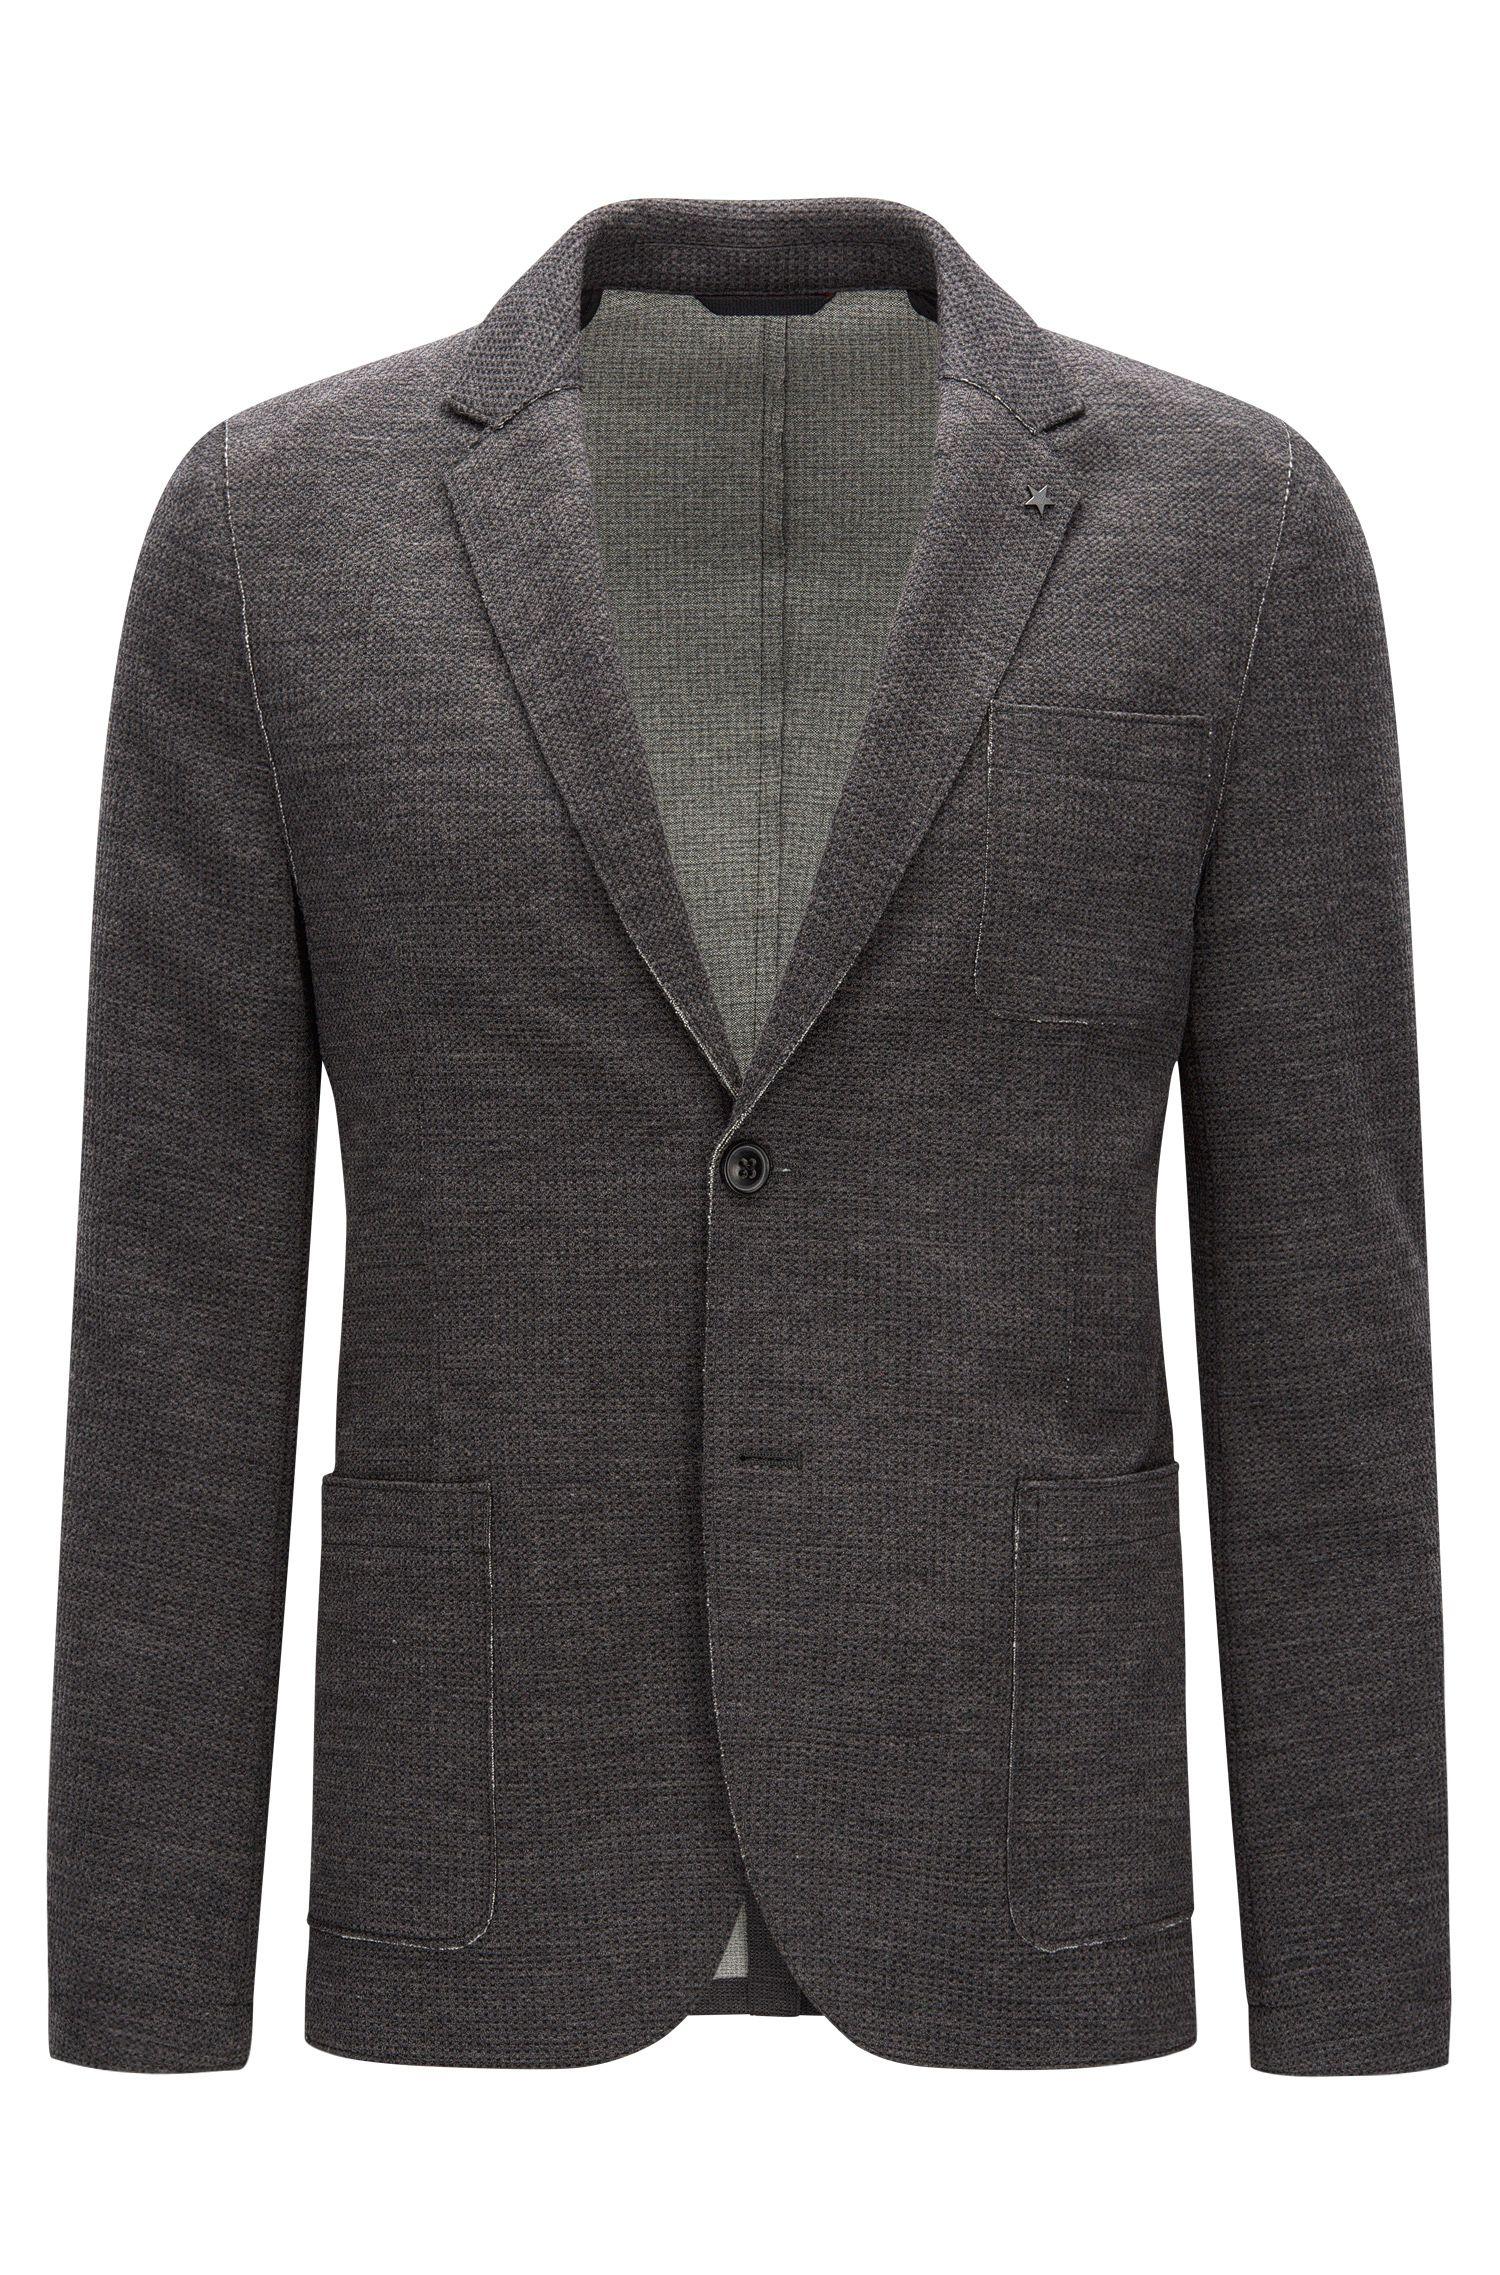 Slim-fit raw-edged jacket in a waffle fabric